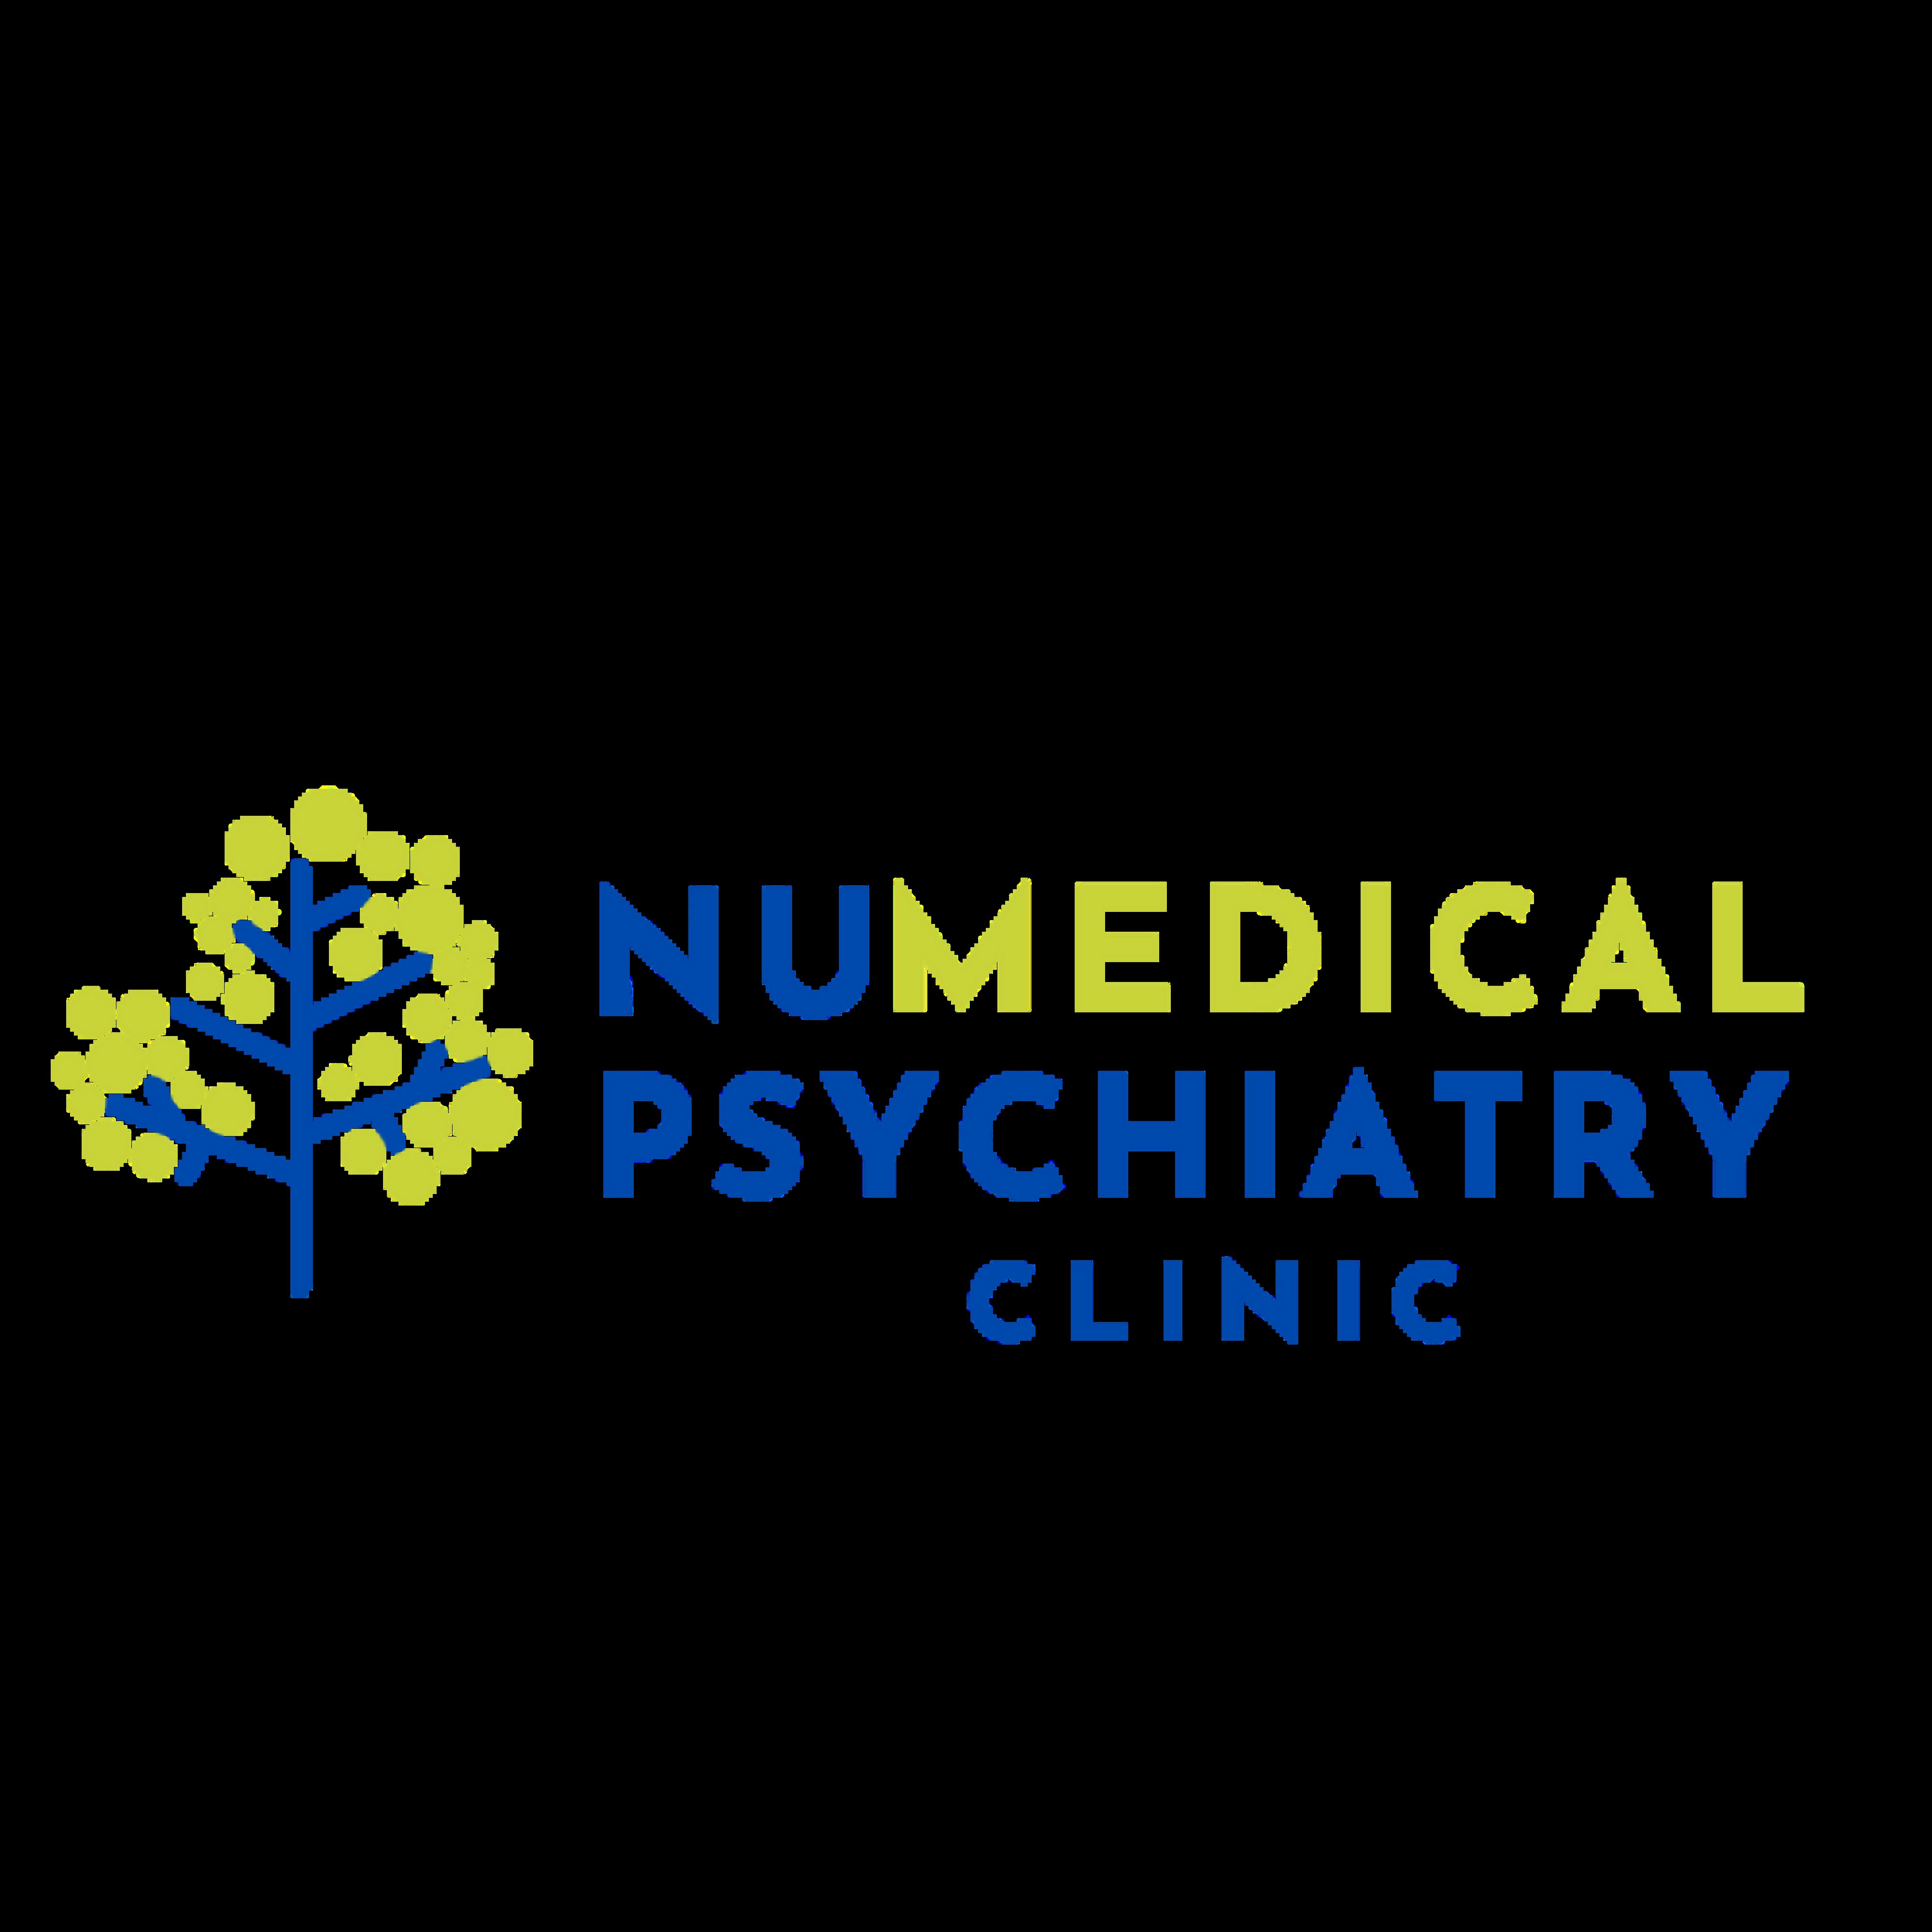 NuMedical & Psychiatry Clinic